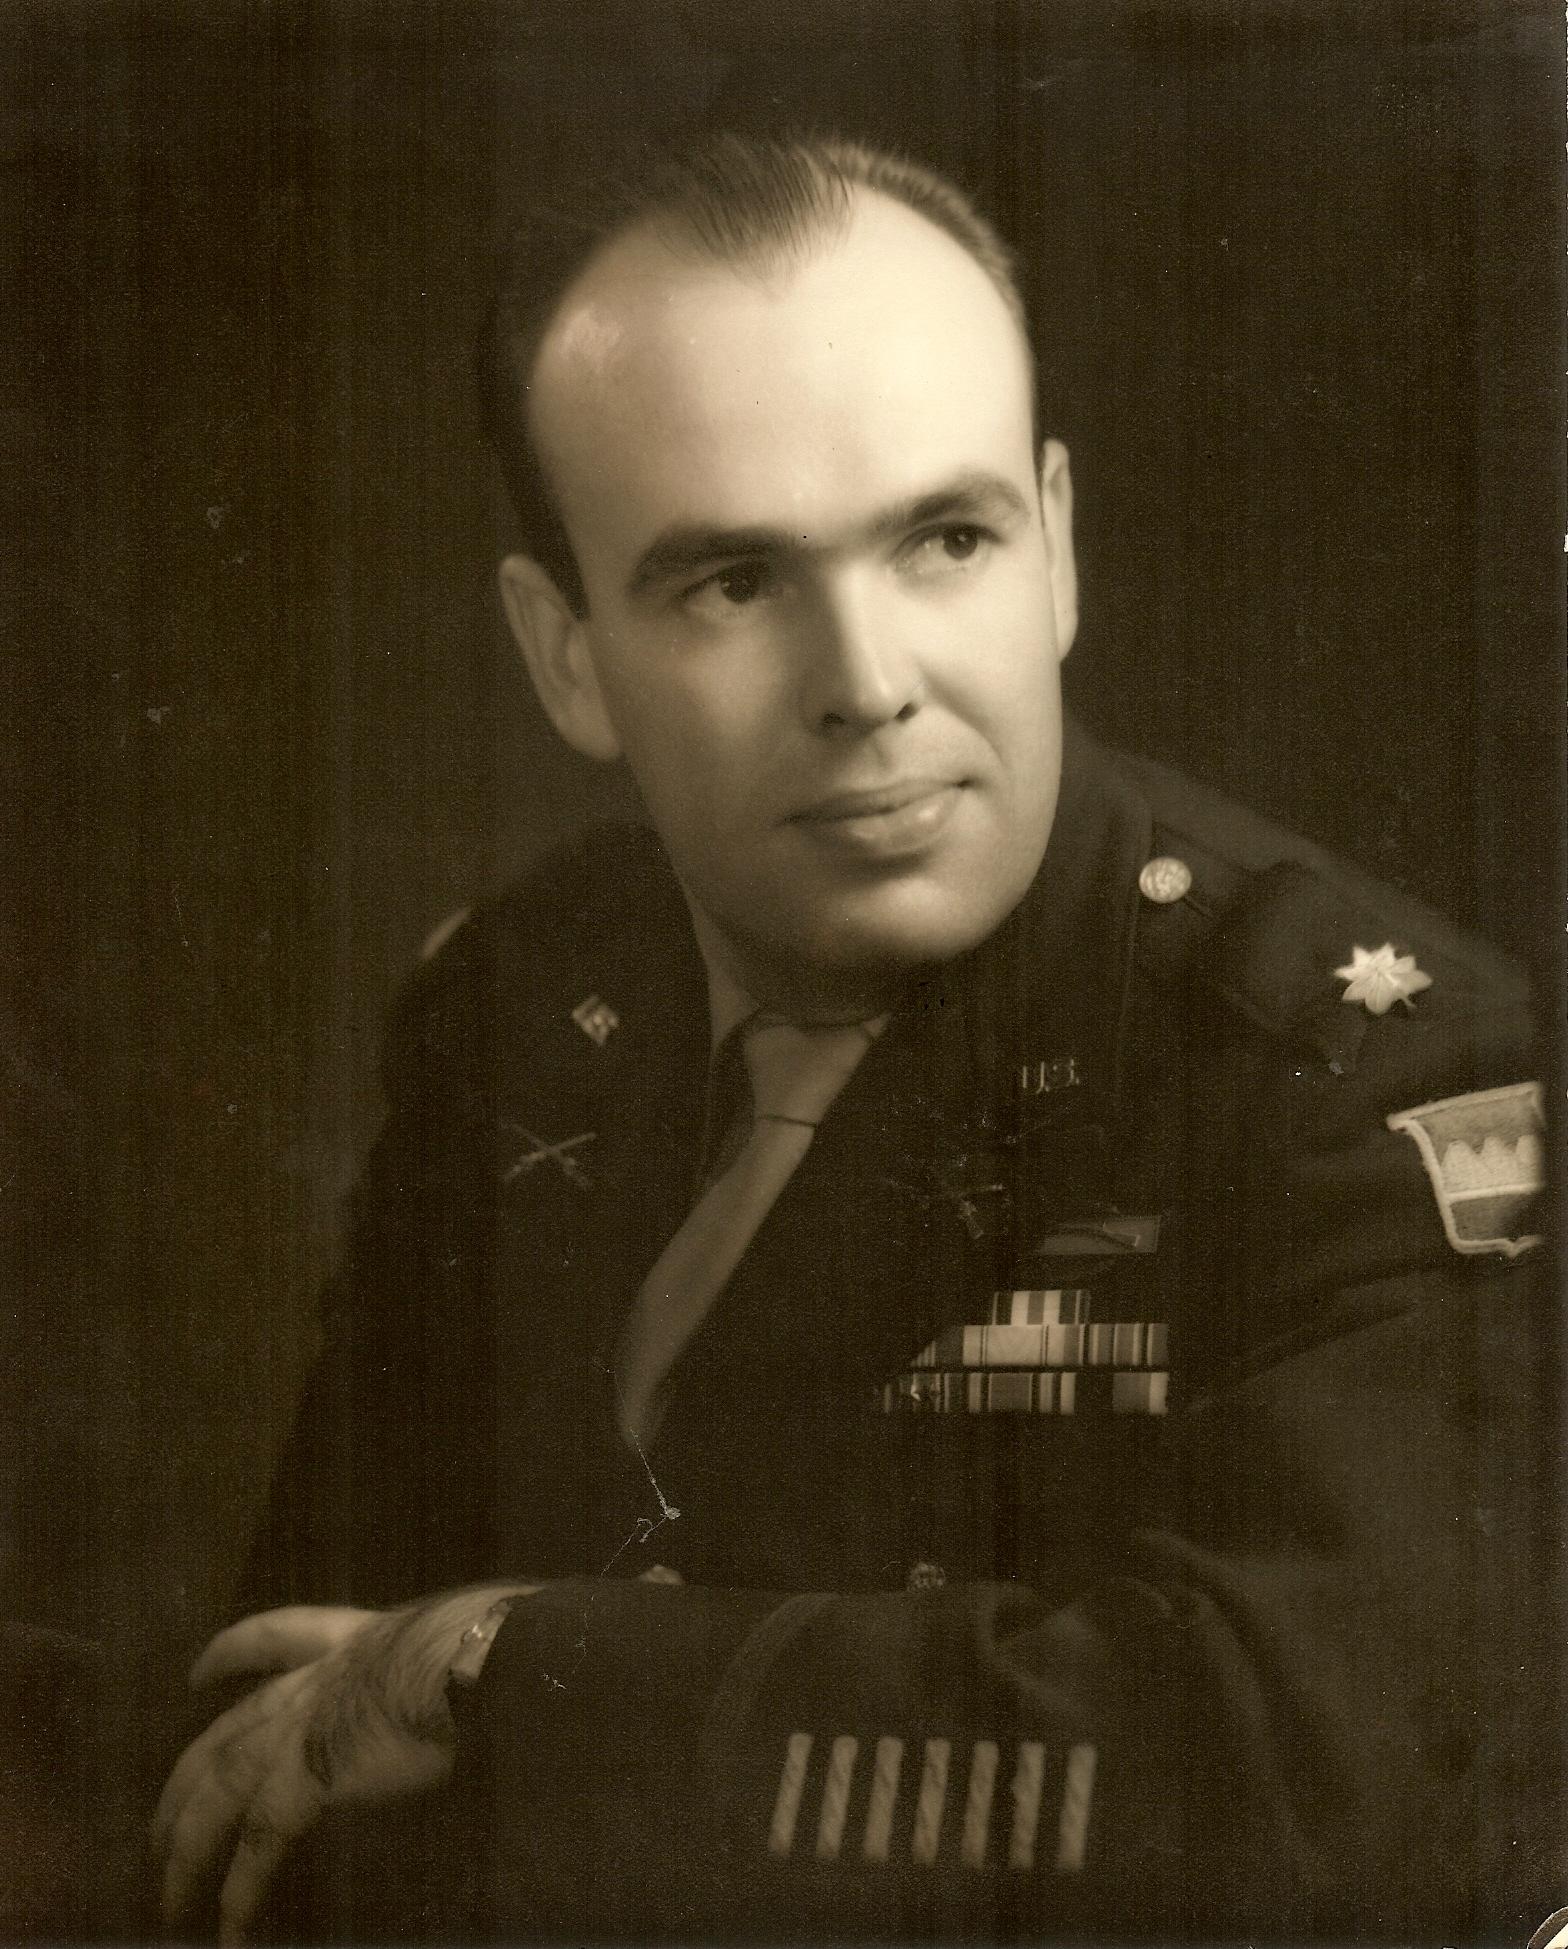 Jack Marshall Sr Army portrait